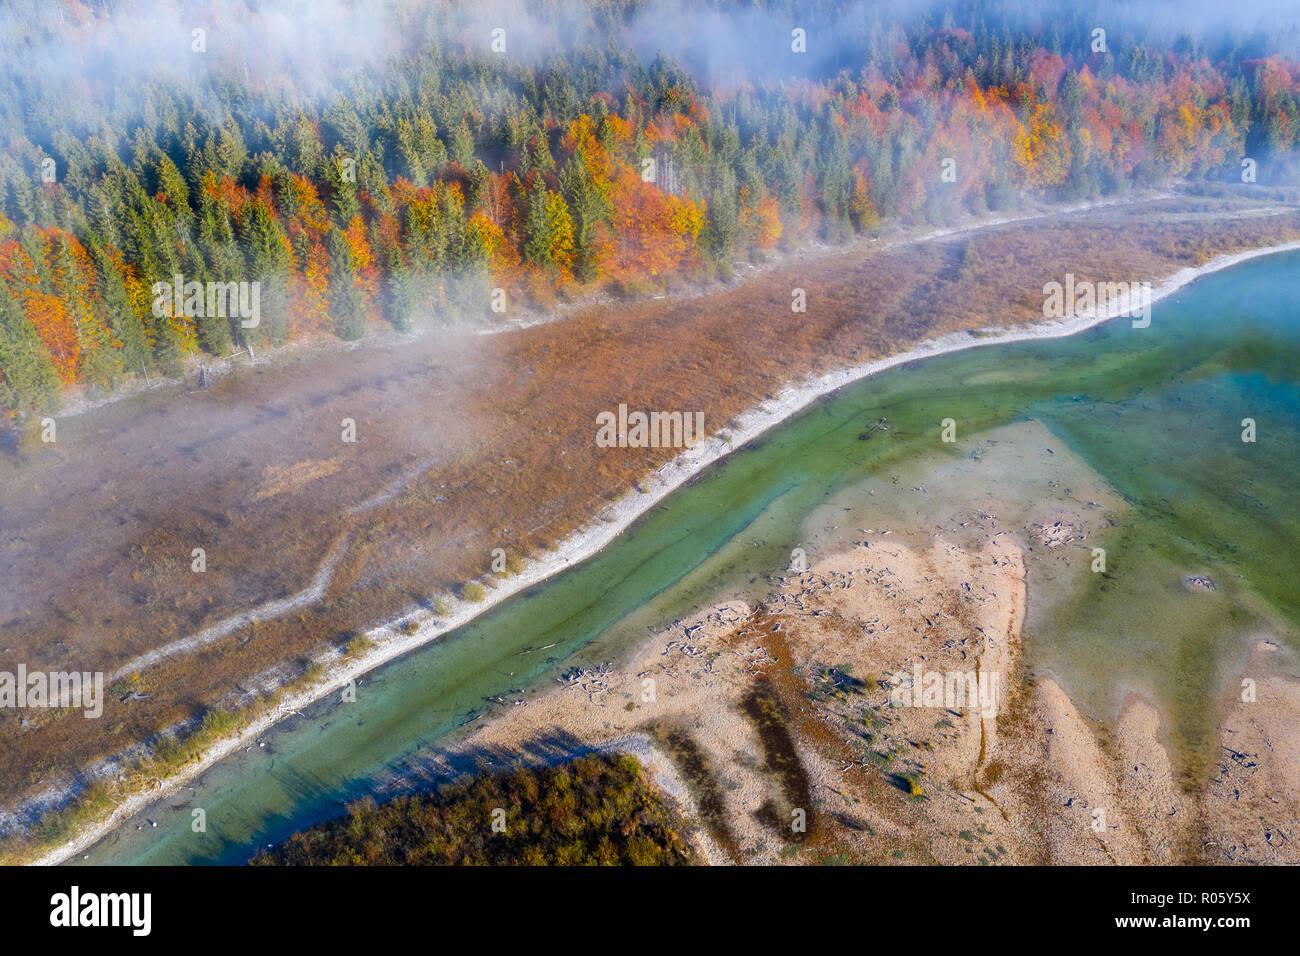 Isar, at the inflow into the Sylvenstein lake, Sylvenstein reservoir, drone image, Lenggries, Isarwinkel, Upper Bavaria, Bavaria - Stock Image